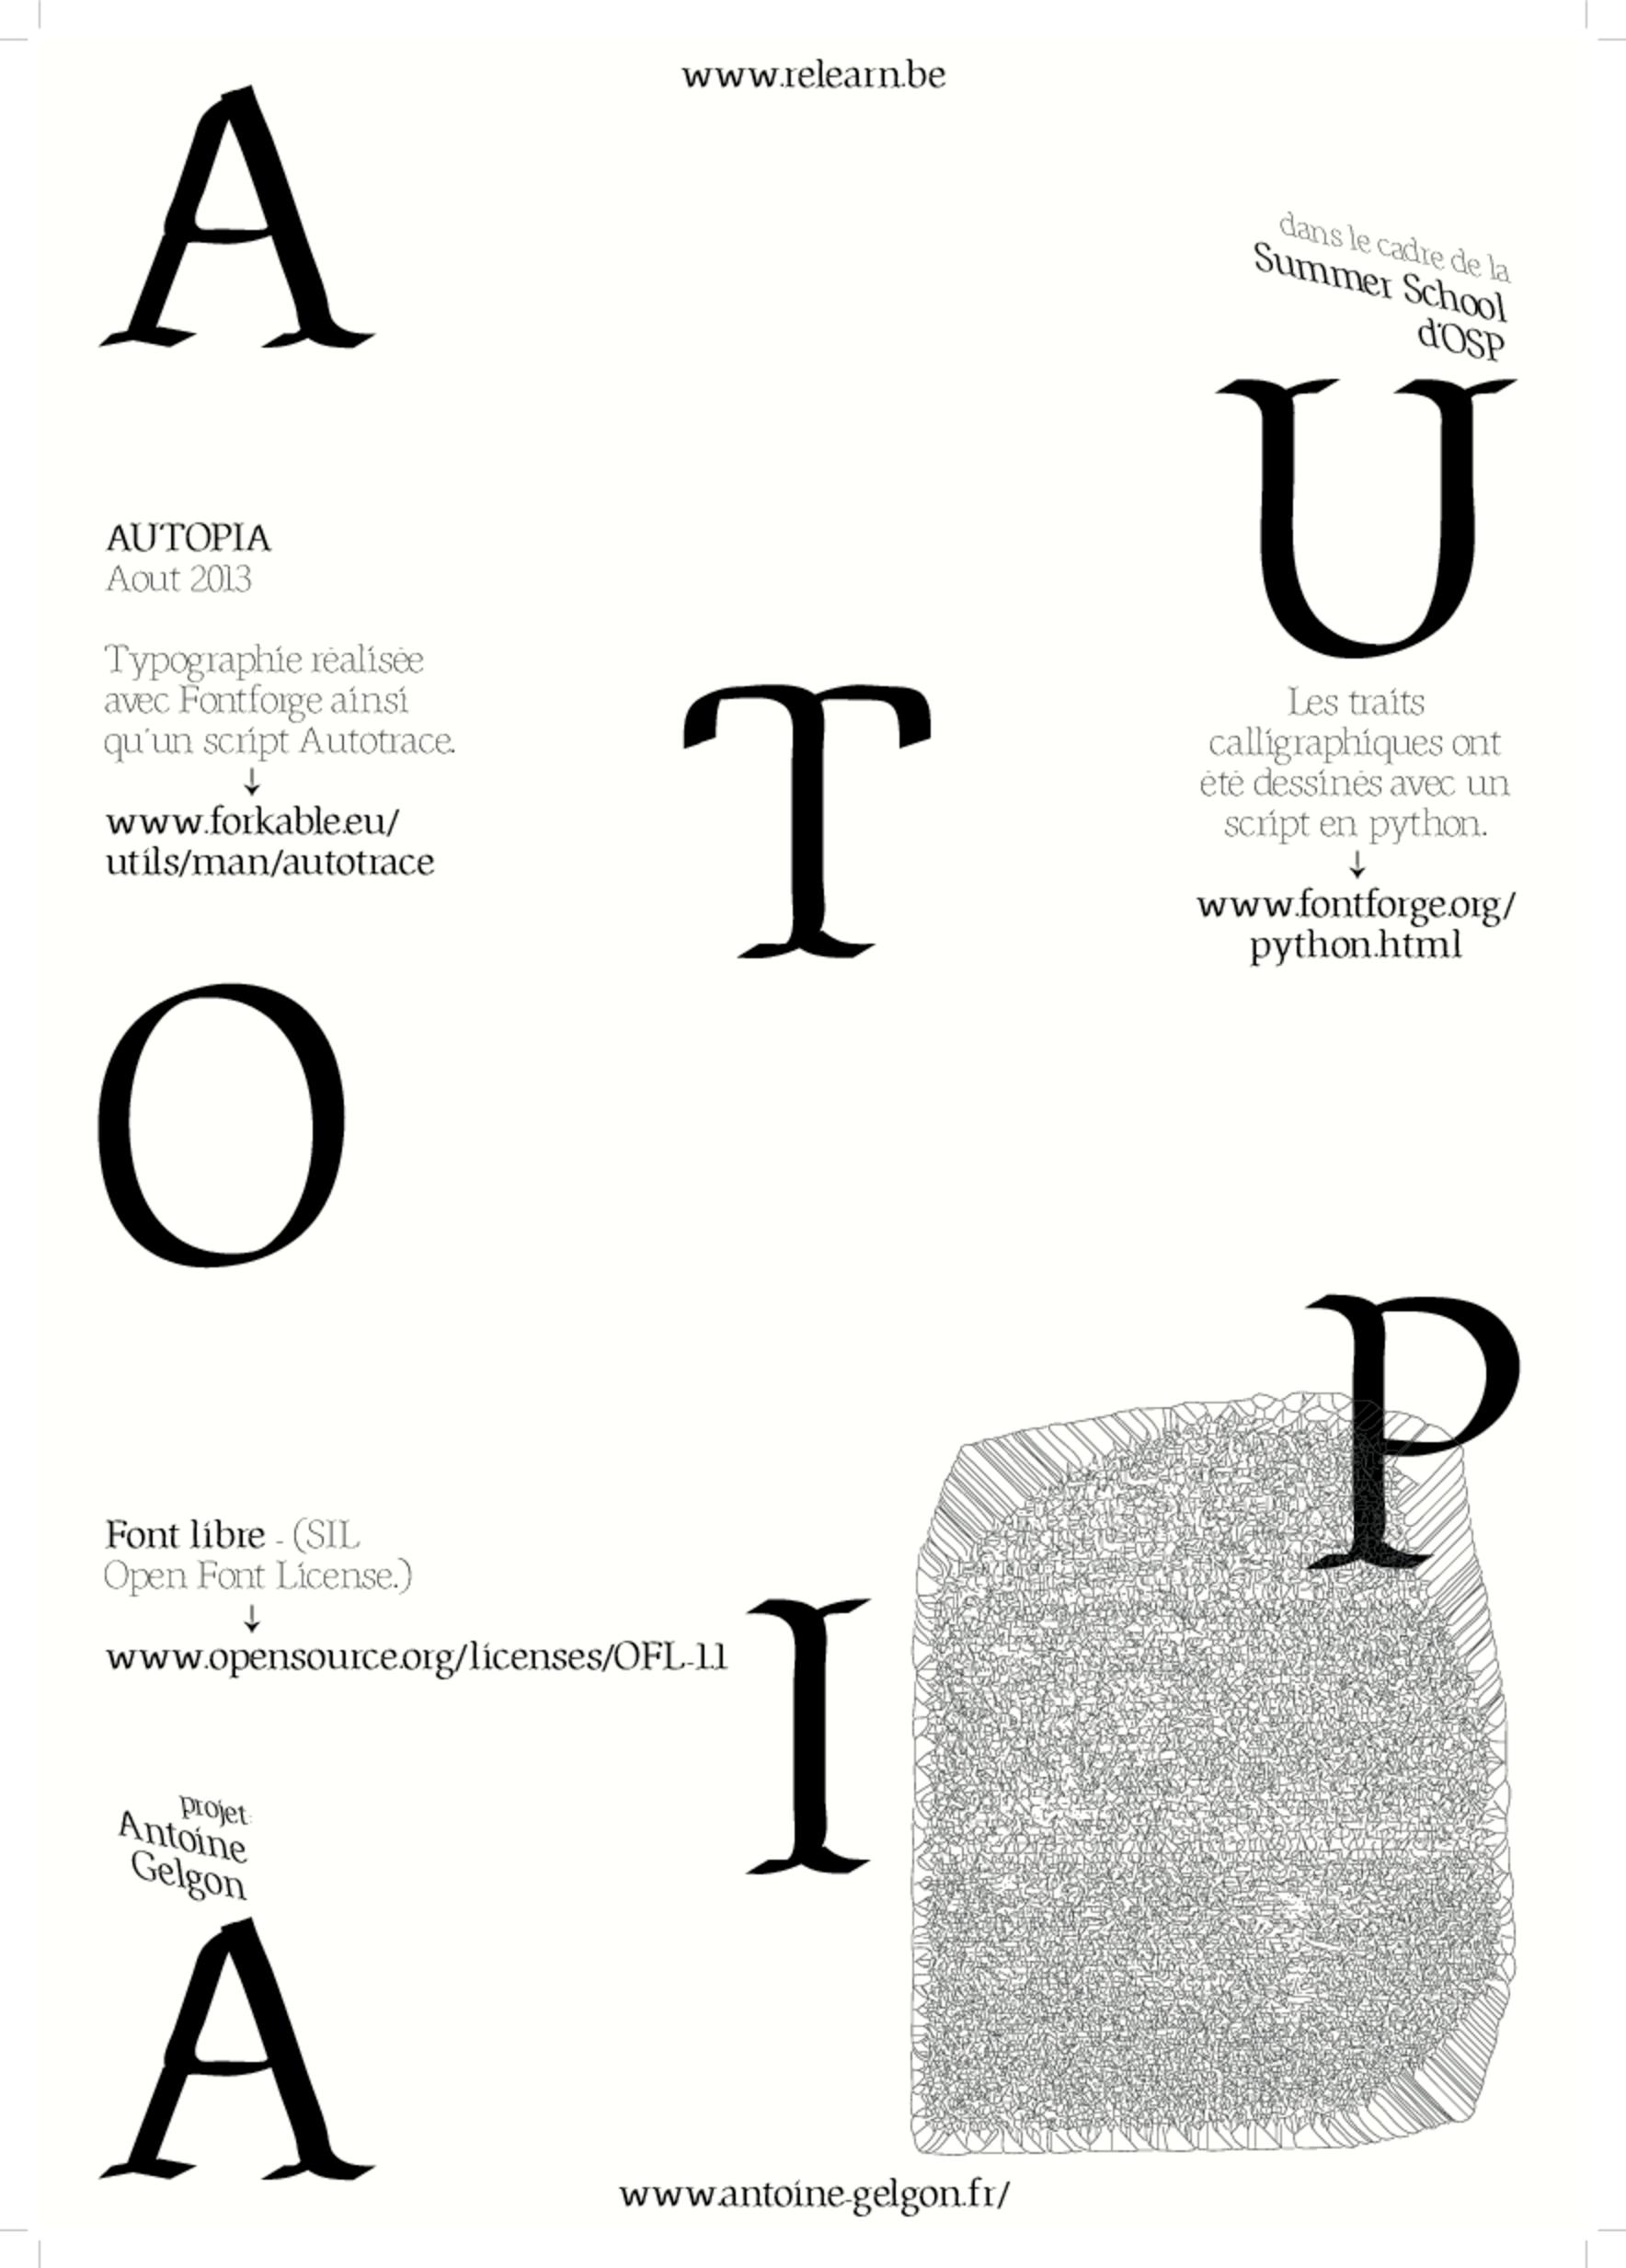 Autopia-presenta/specimen-autopia-1.png